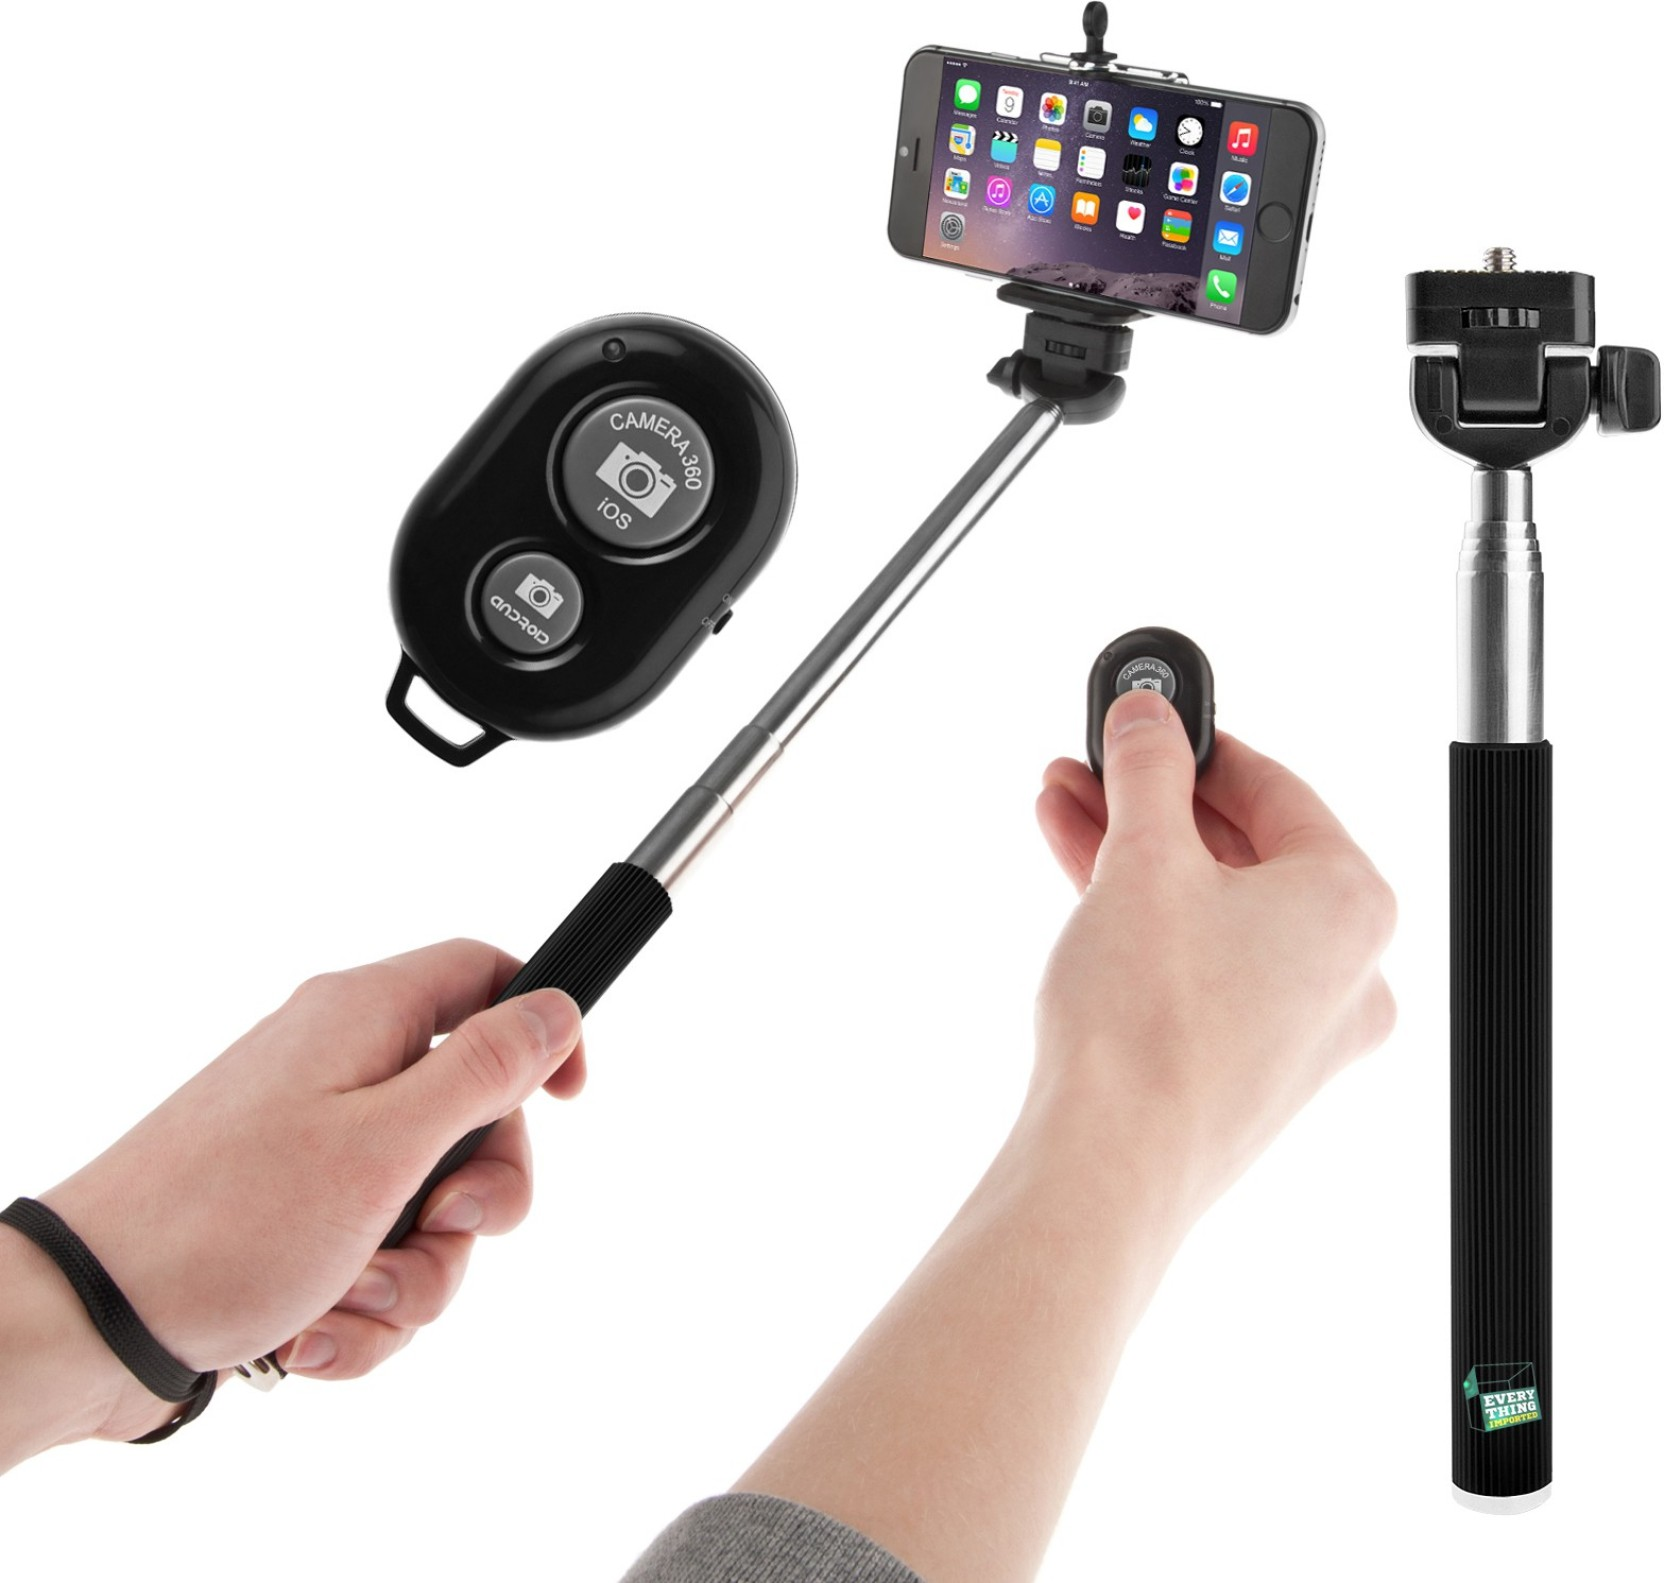 evana remote selfie stick selfie stick evana. Black Bedroom Furniture Sets. Home Design Ideas